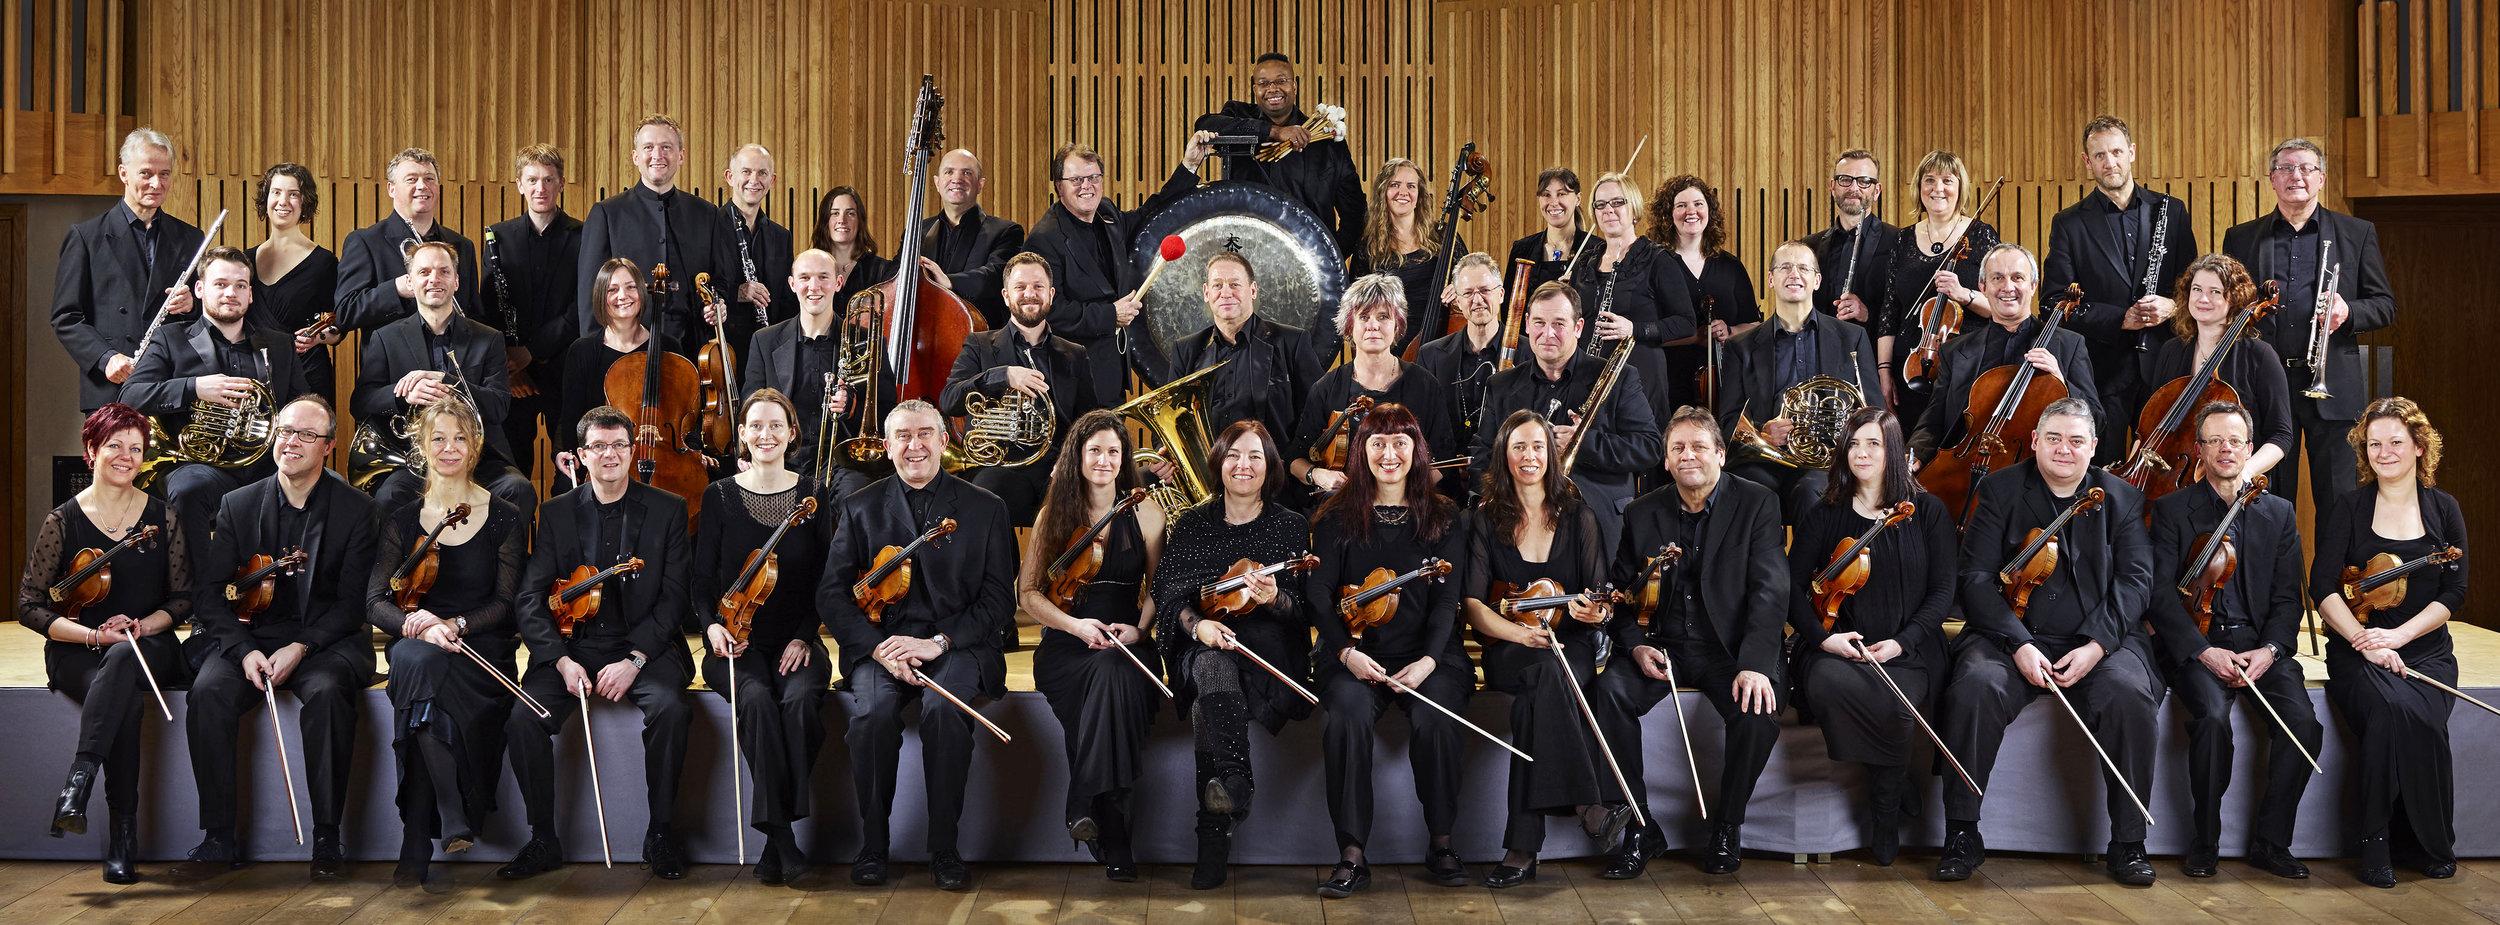 Ryedale Festival 1 Orchestra of Opera North by Richard Moran.jpg